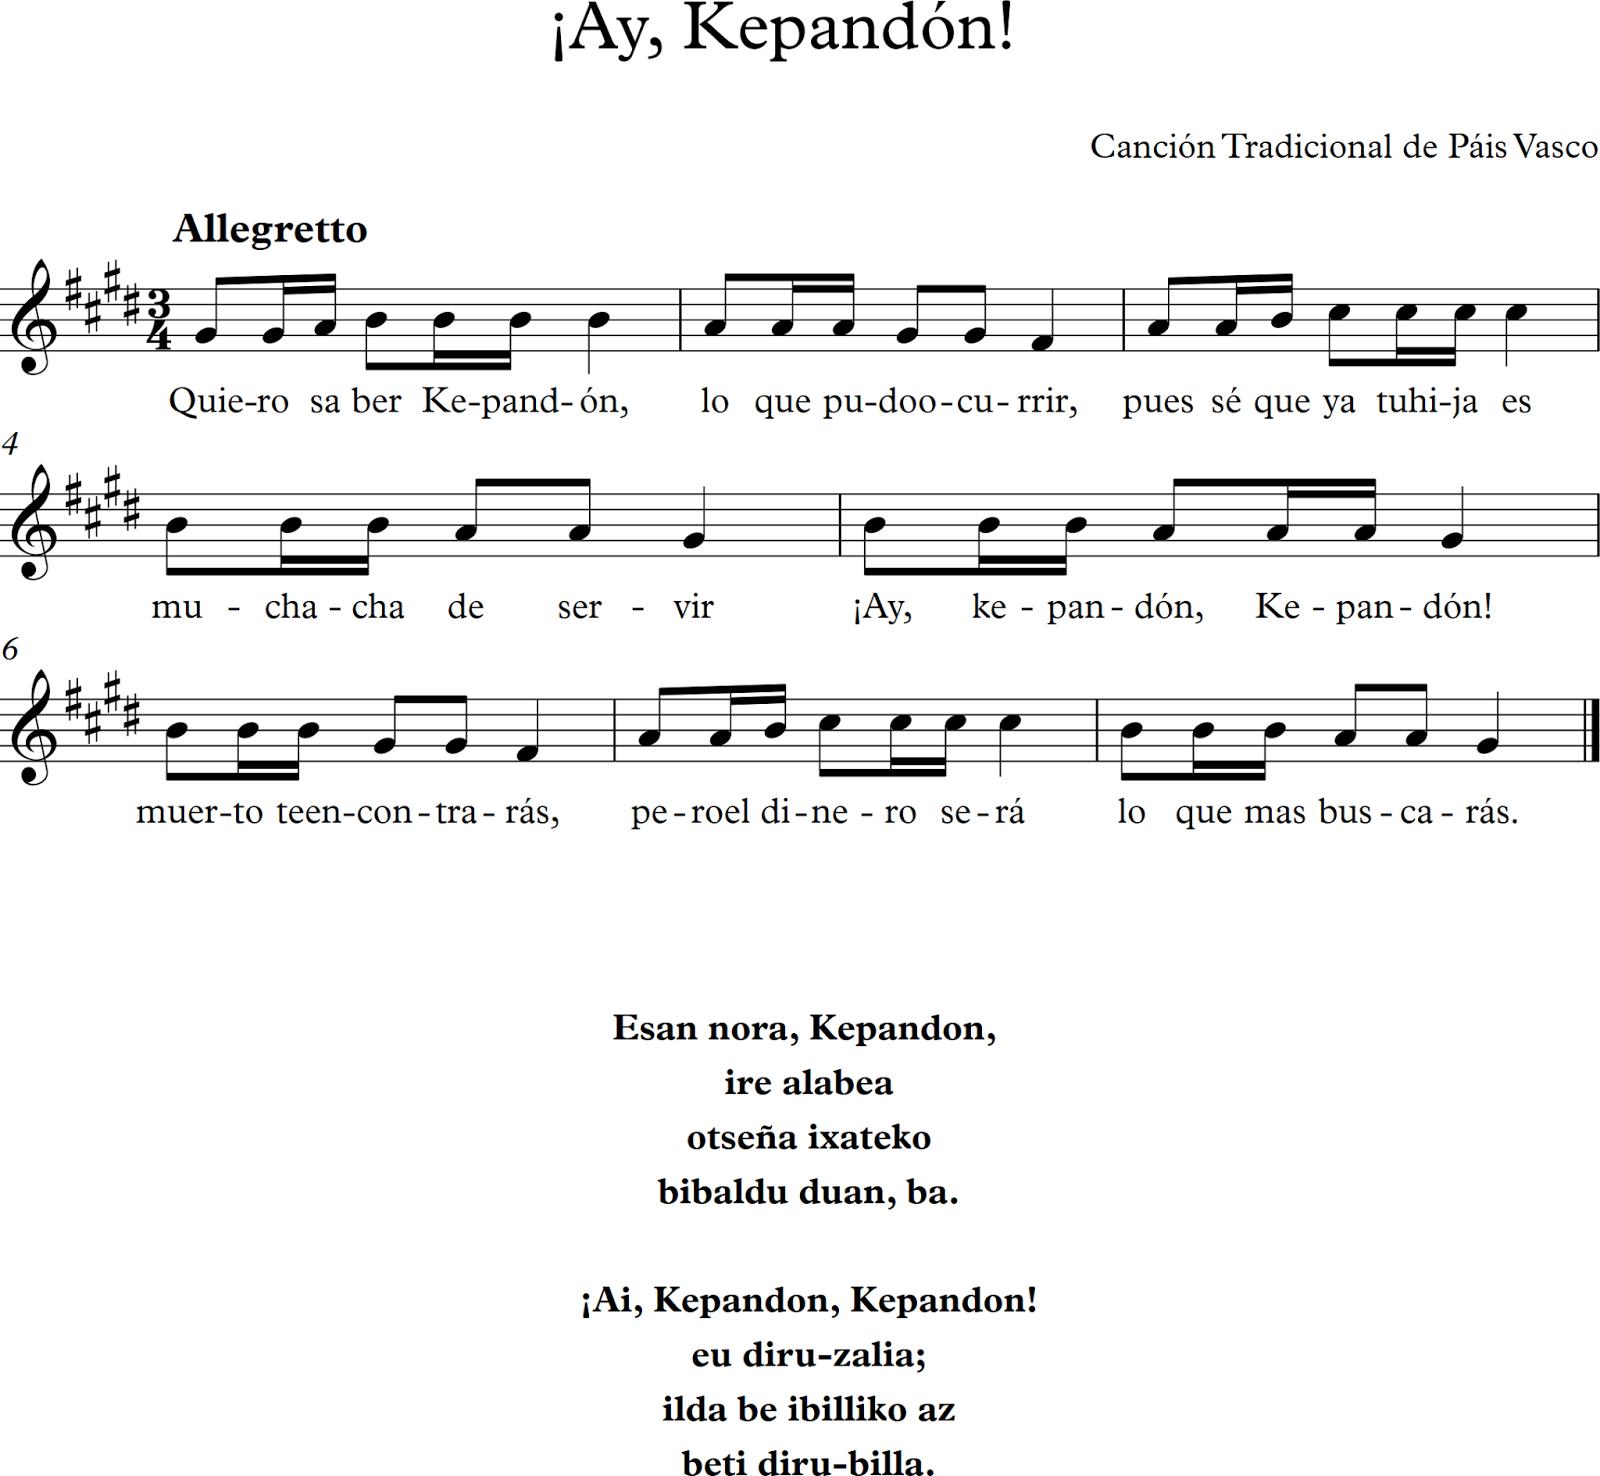 Canción Tradicional del País Vasco.